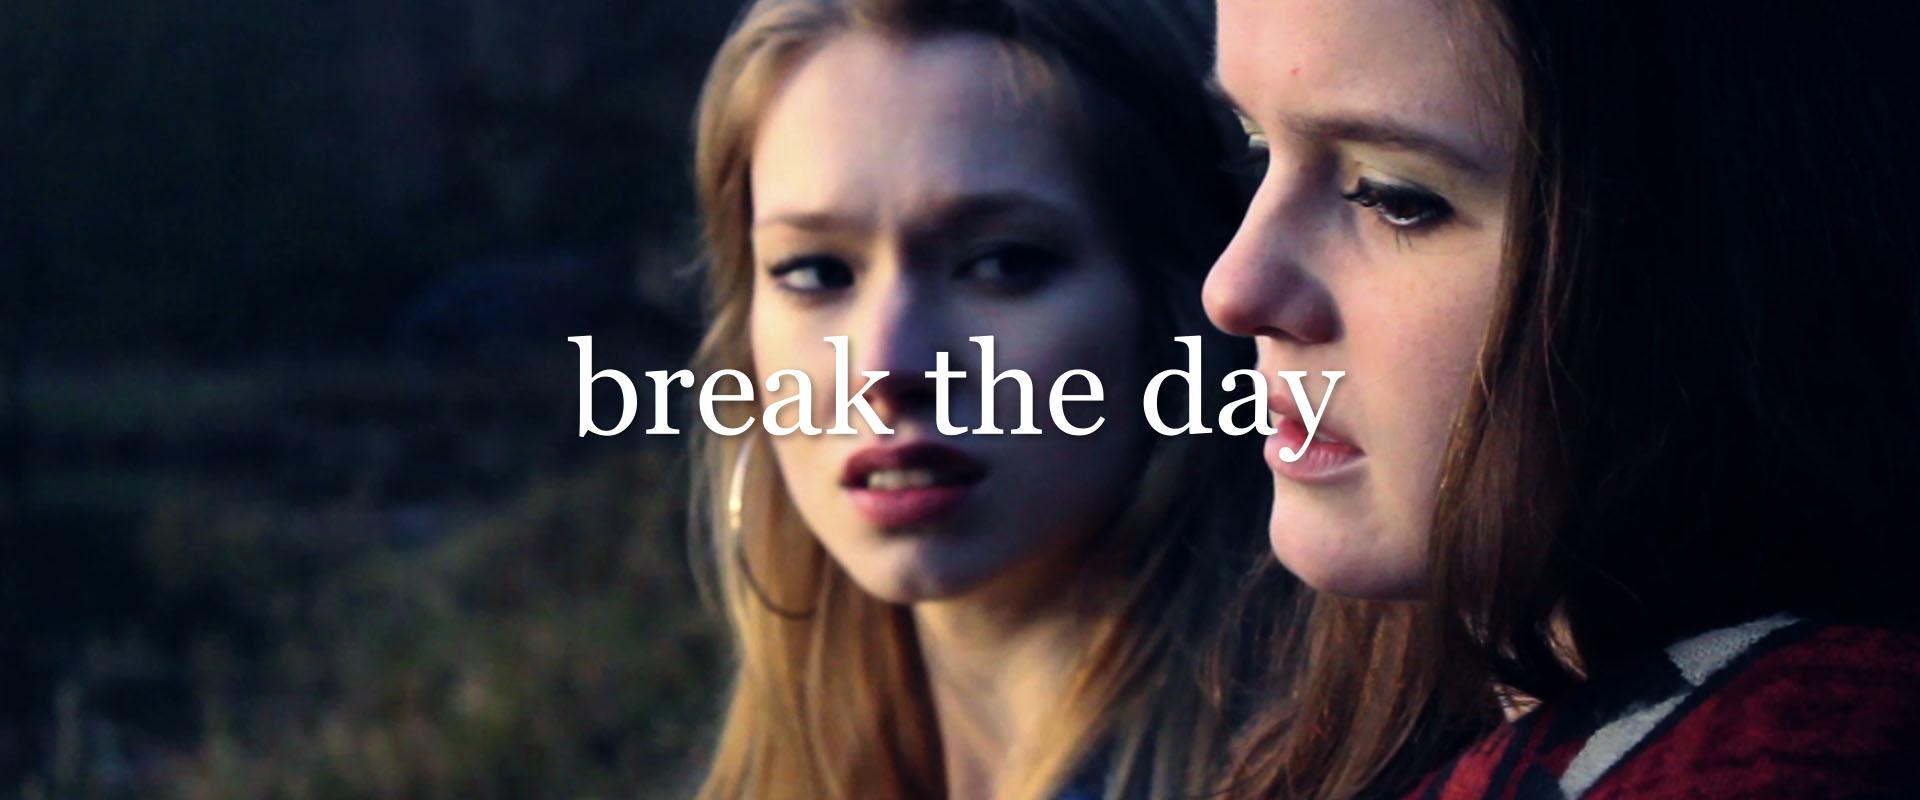 break the day lgbt short film drama thumbnail